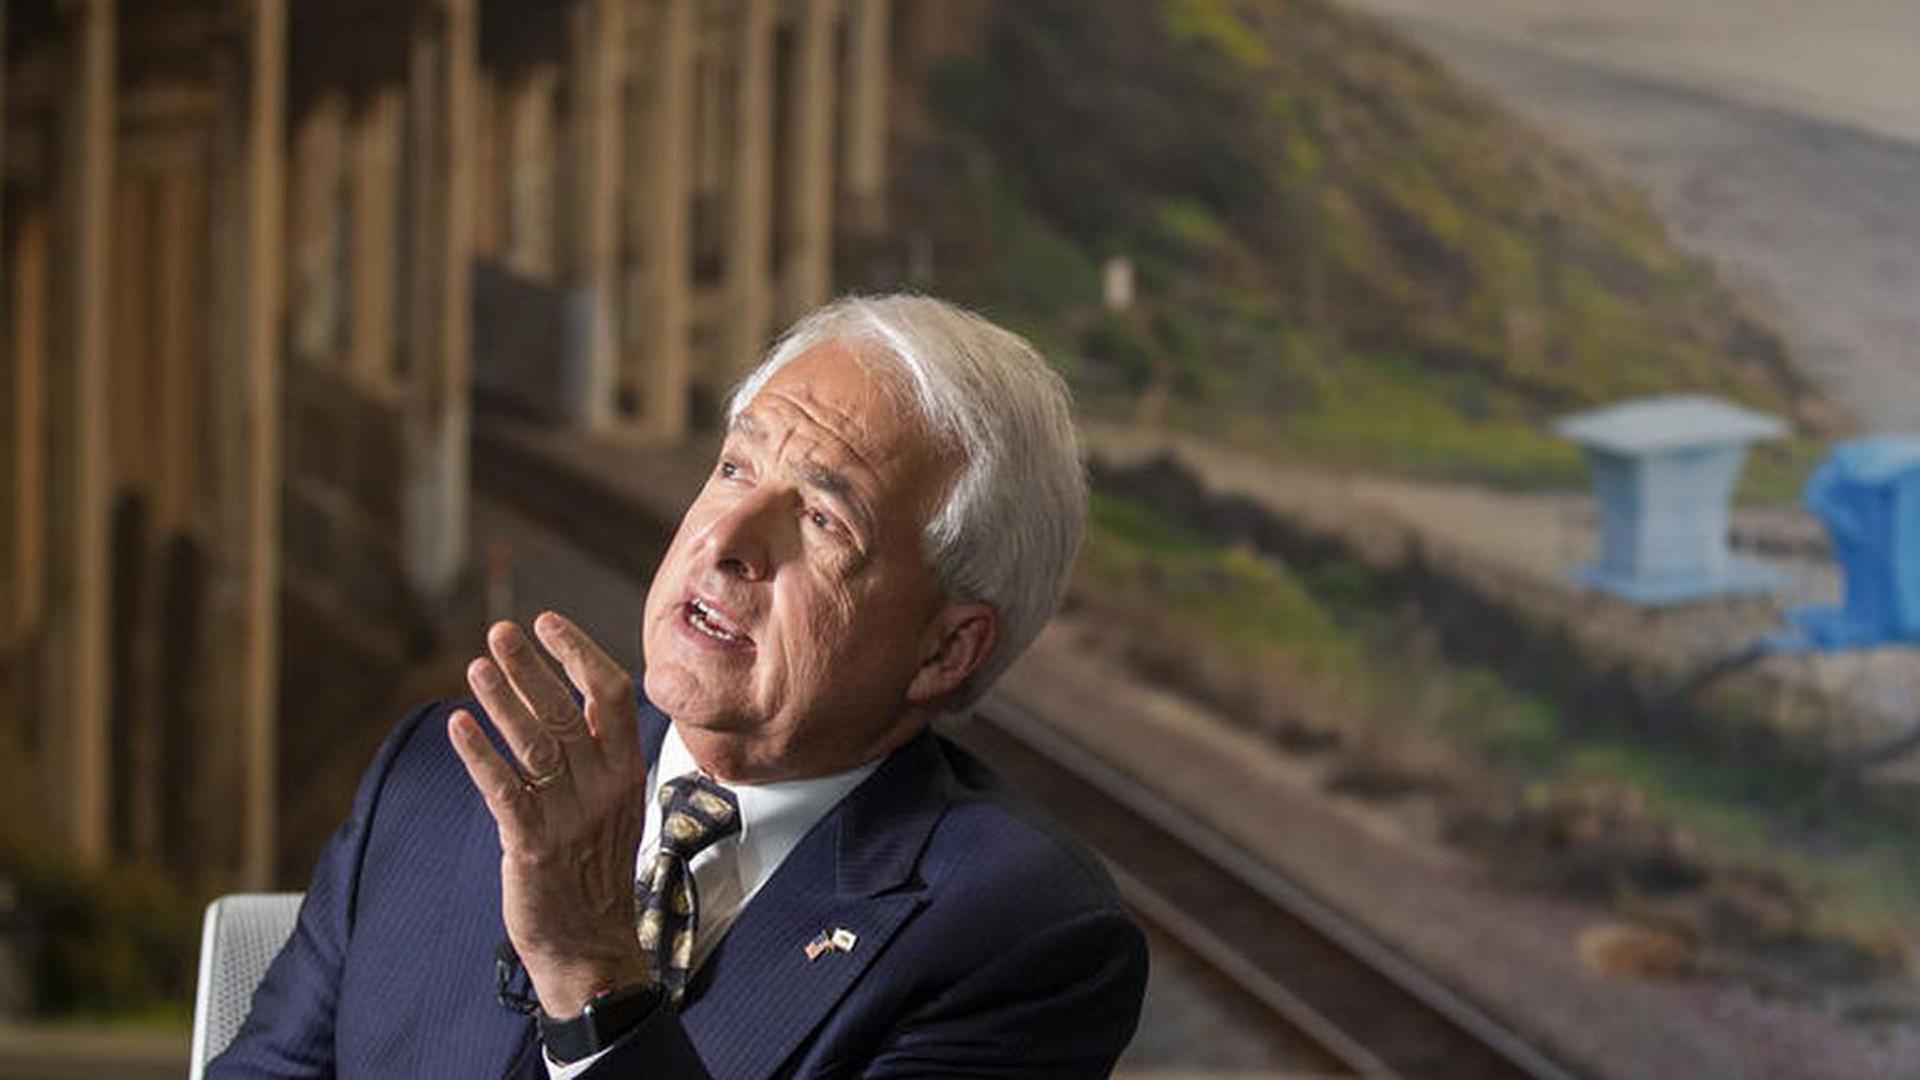 Republican gubernatorial candidate John Cox is seen in an undated photo. (Credit: Allen J. Schaben / Los Angeles Times)